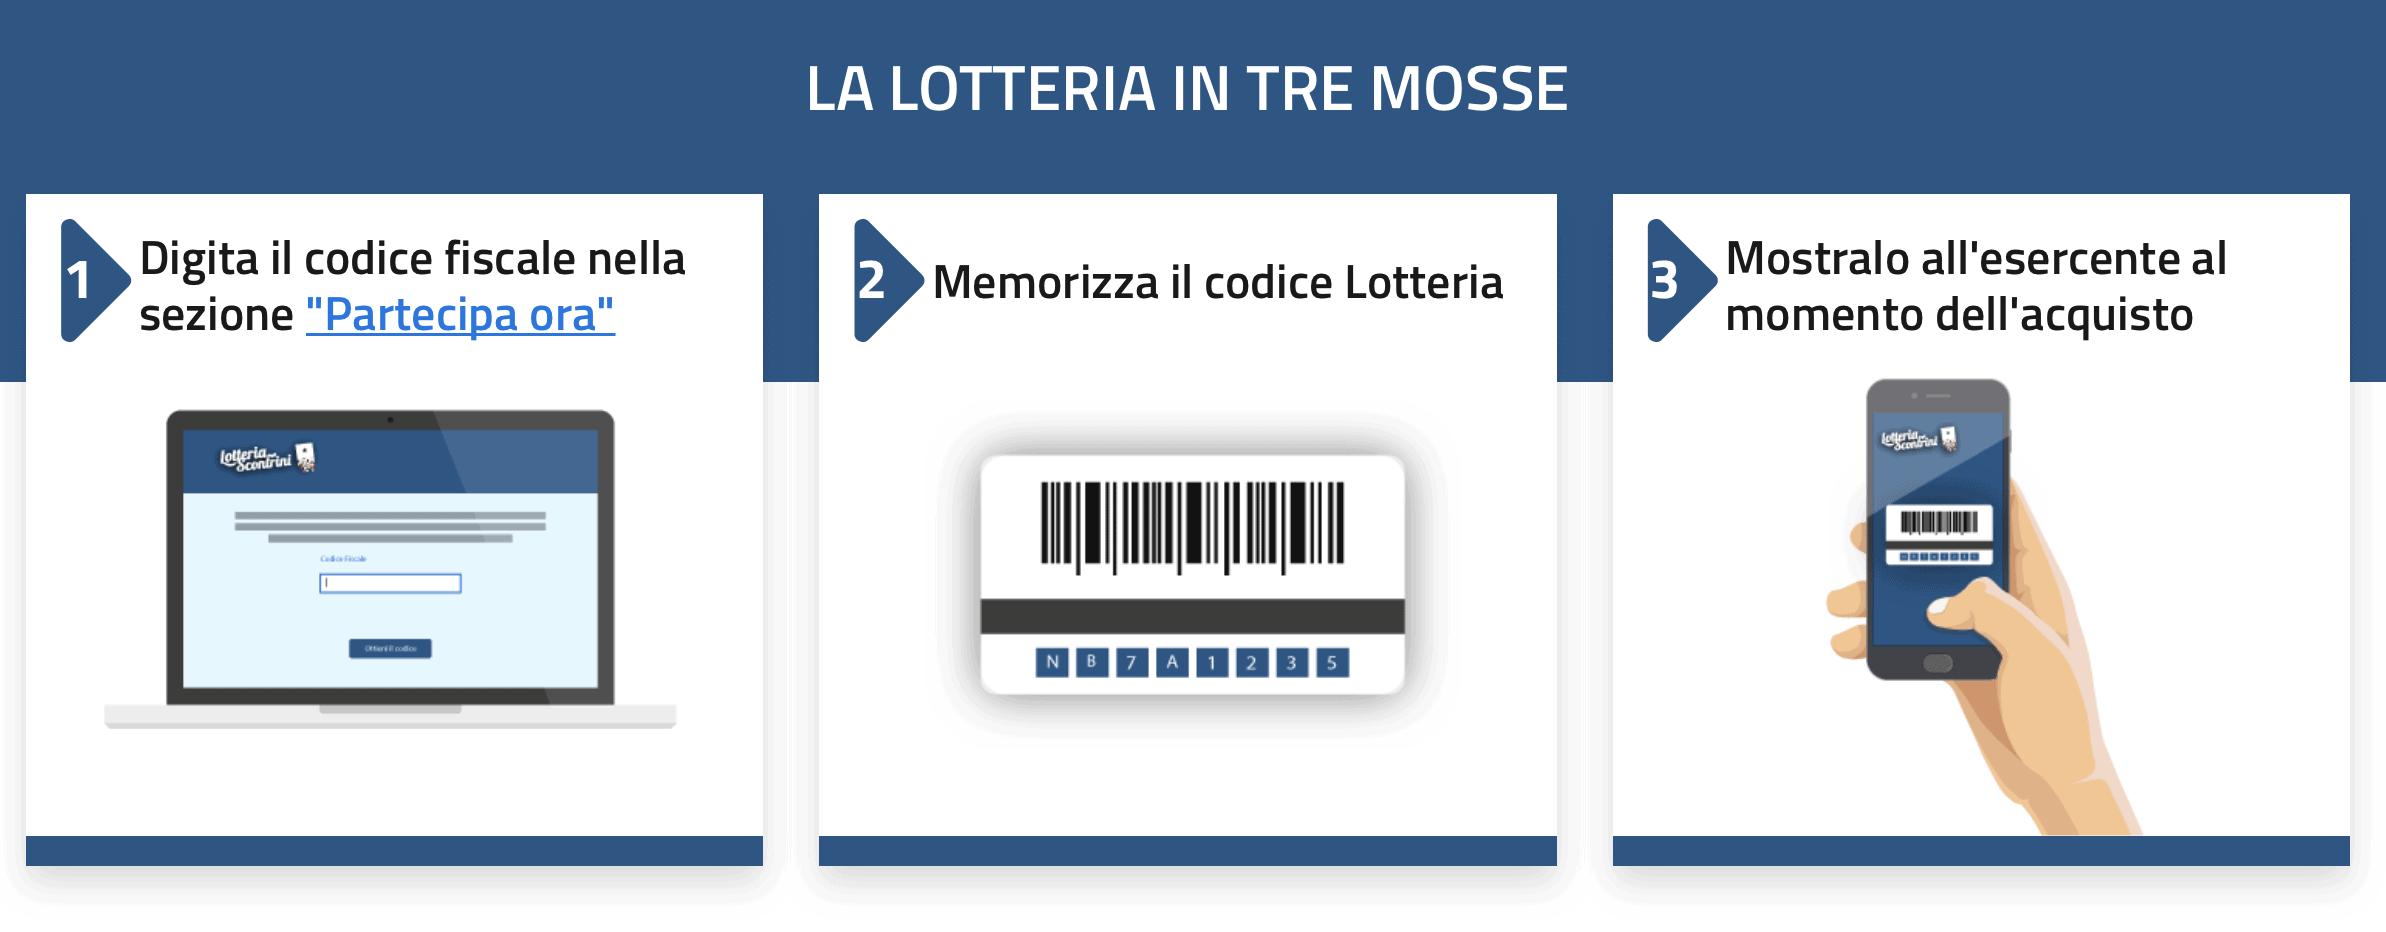 Kassenbon-Lotterie Italien